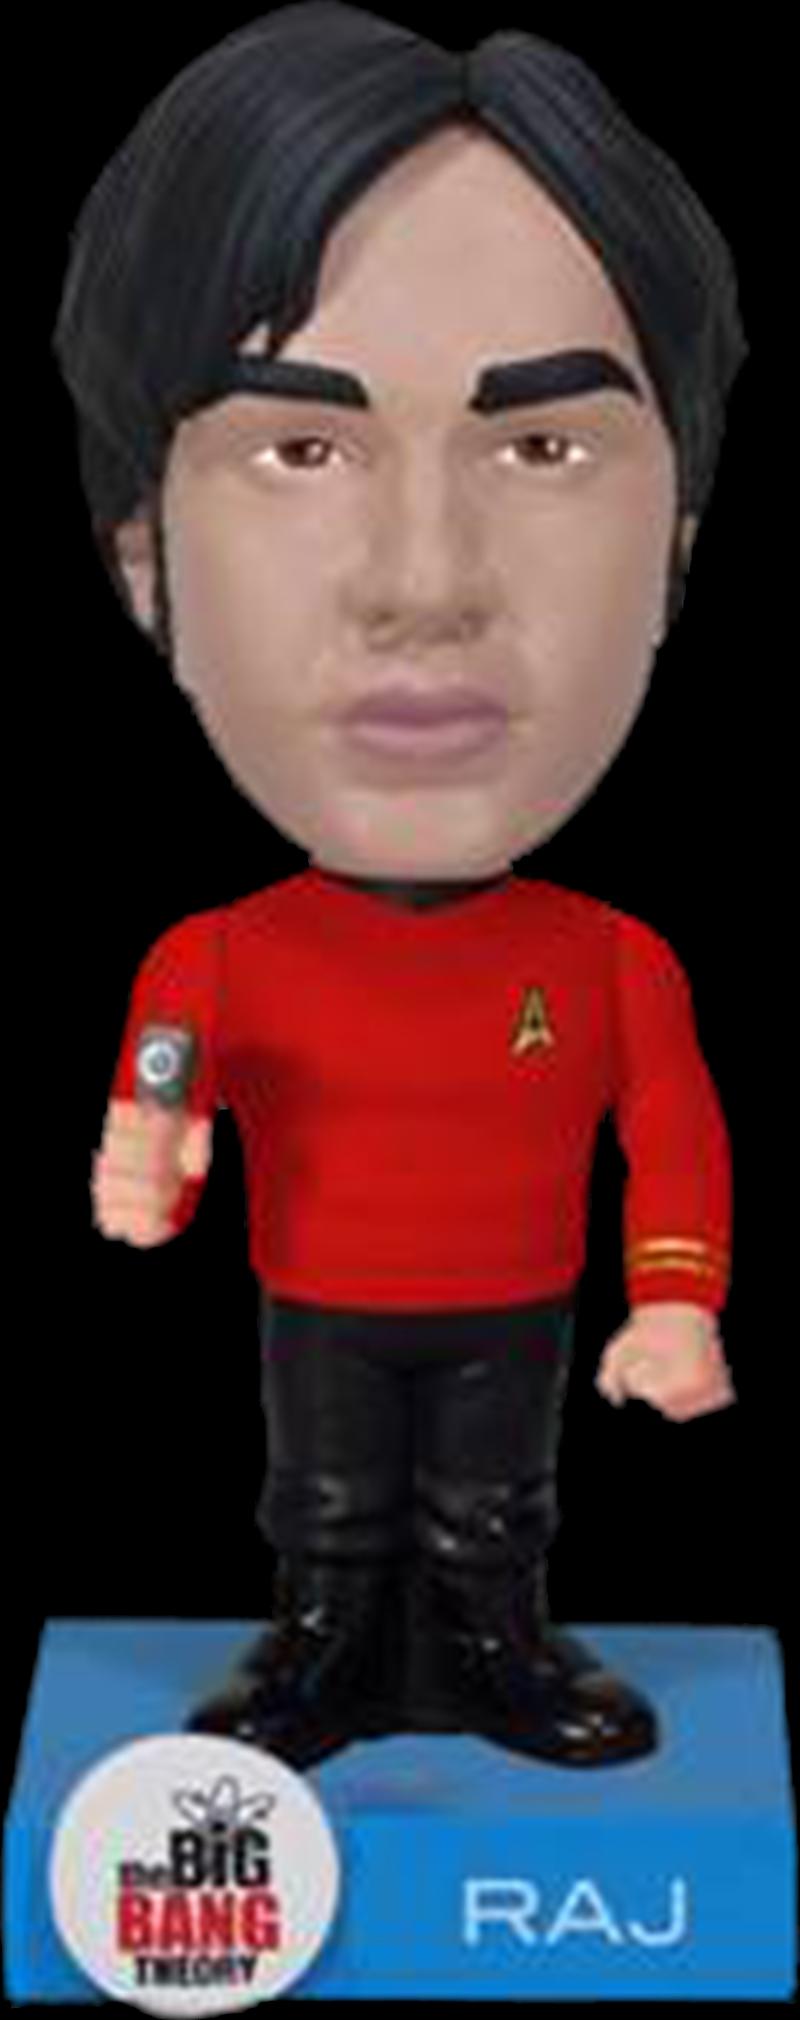 The Big Bang Theory - Raj Star Trek Wacky Wobbler | Merchandise